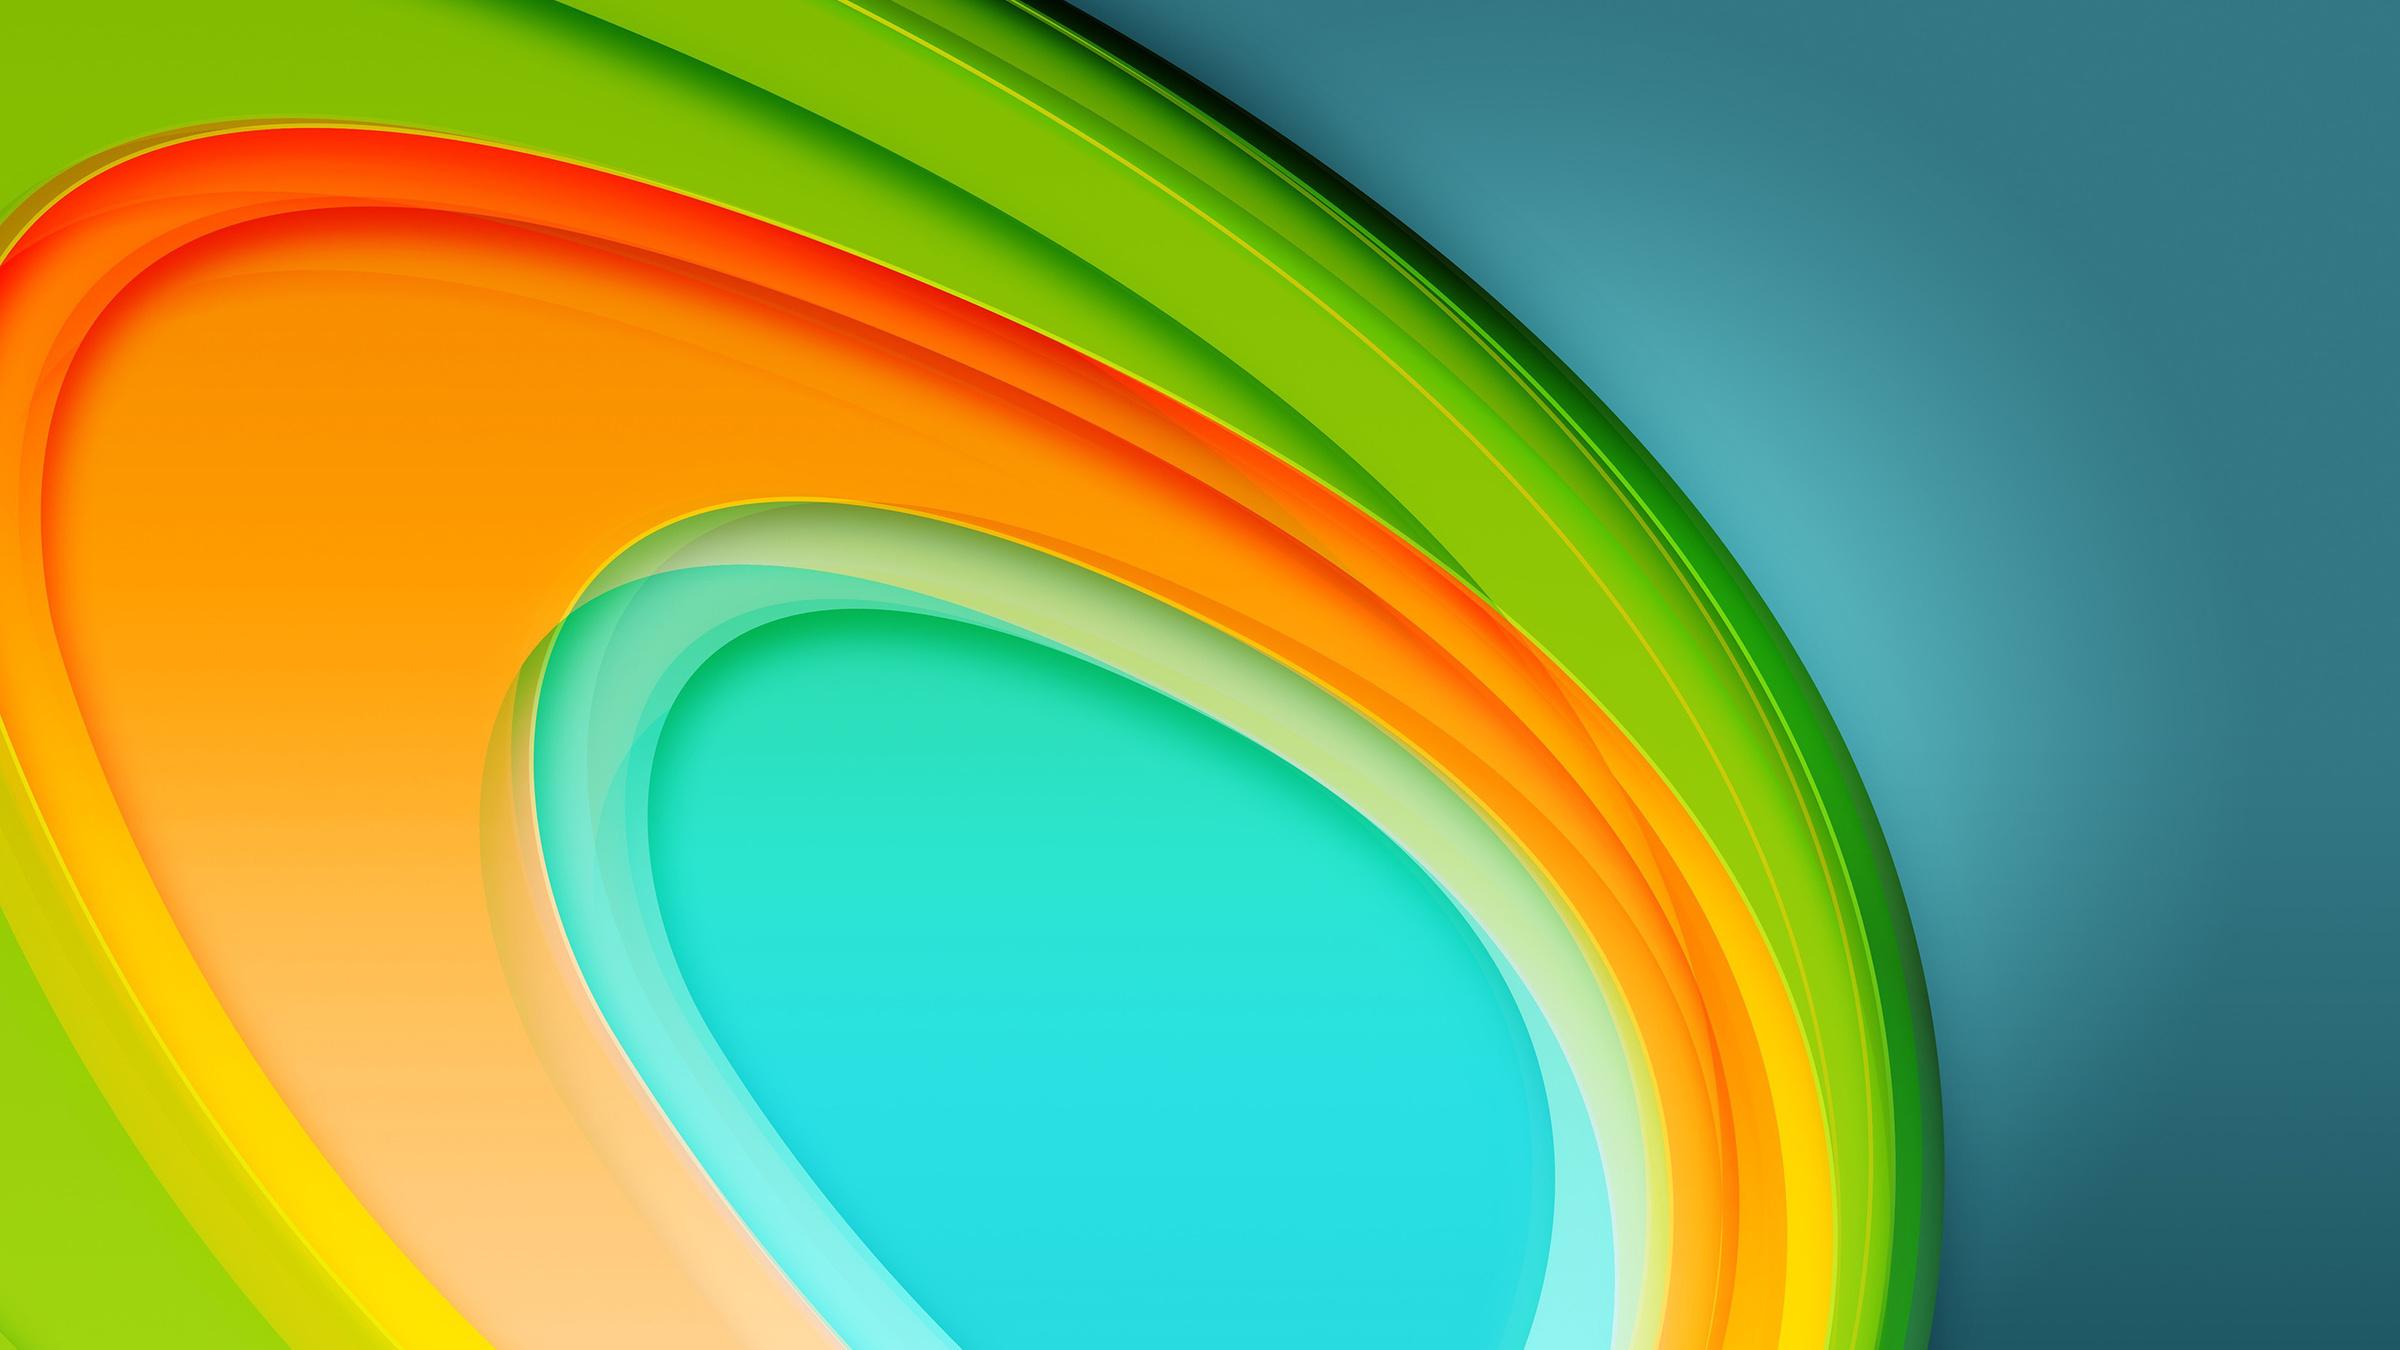 Colorful Circles 4K 5K (2400x1350)